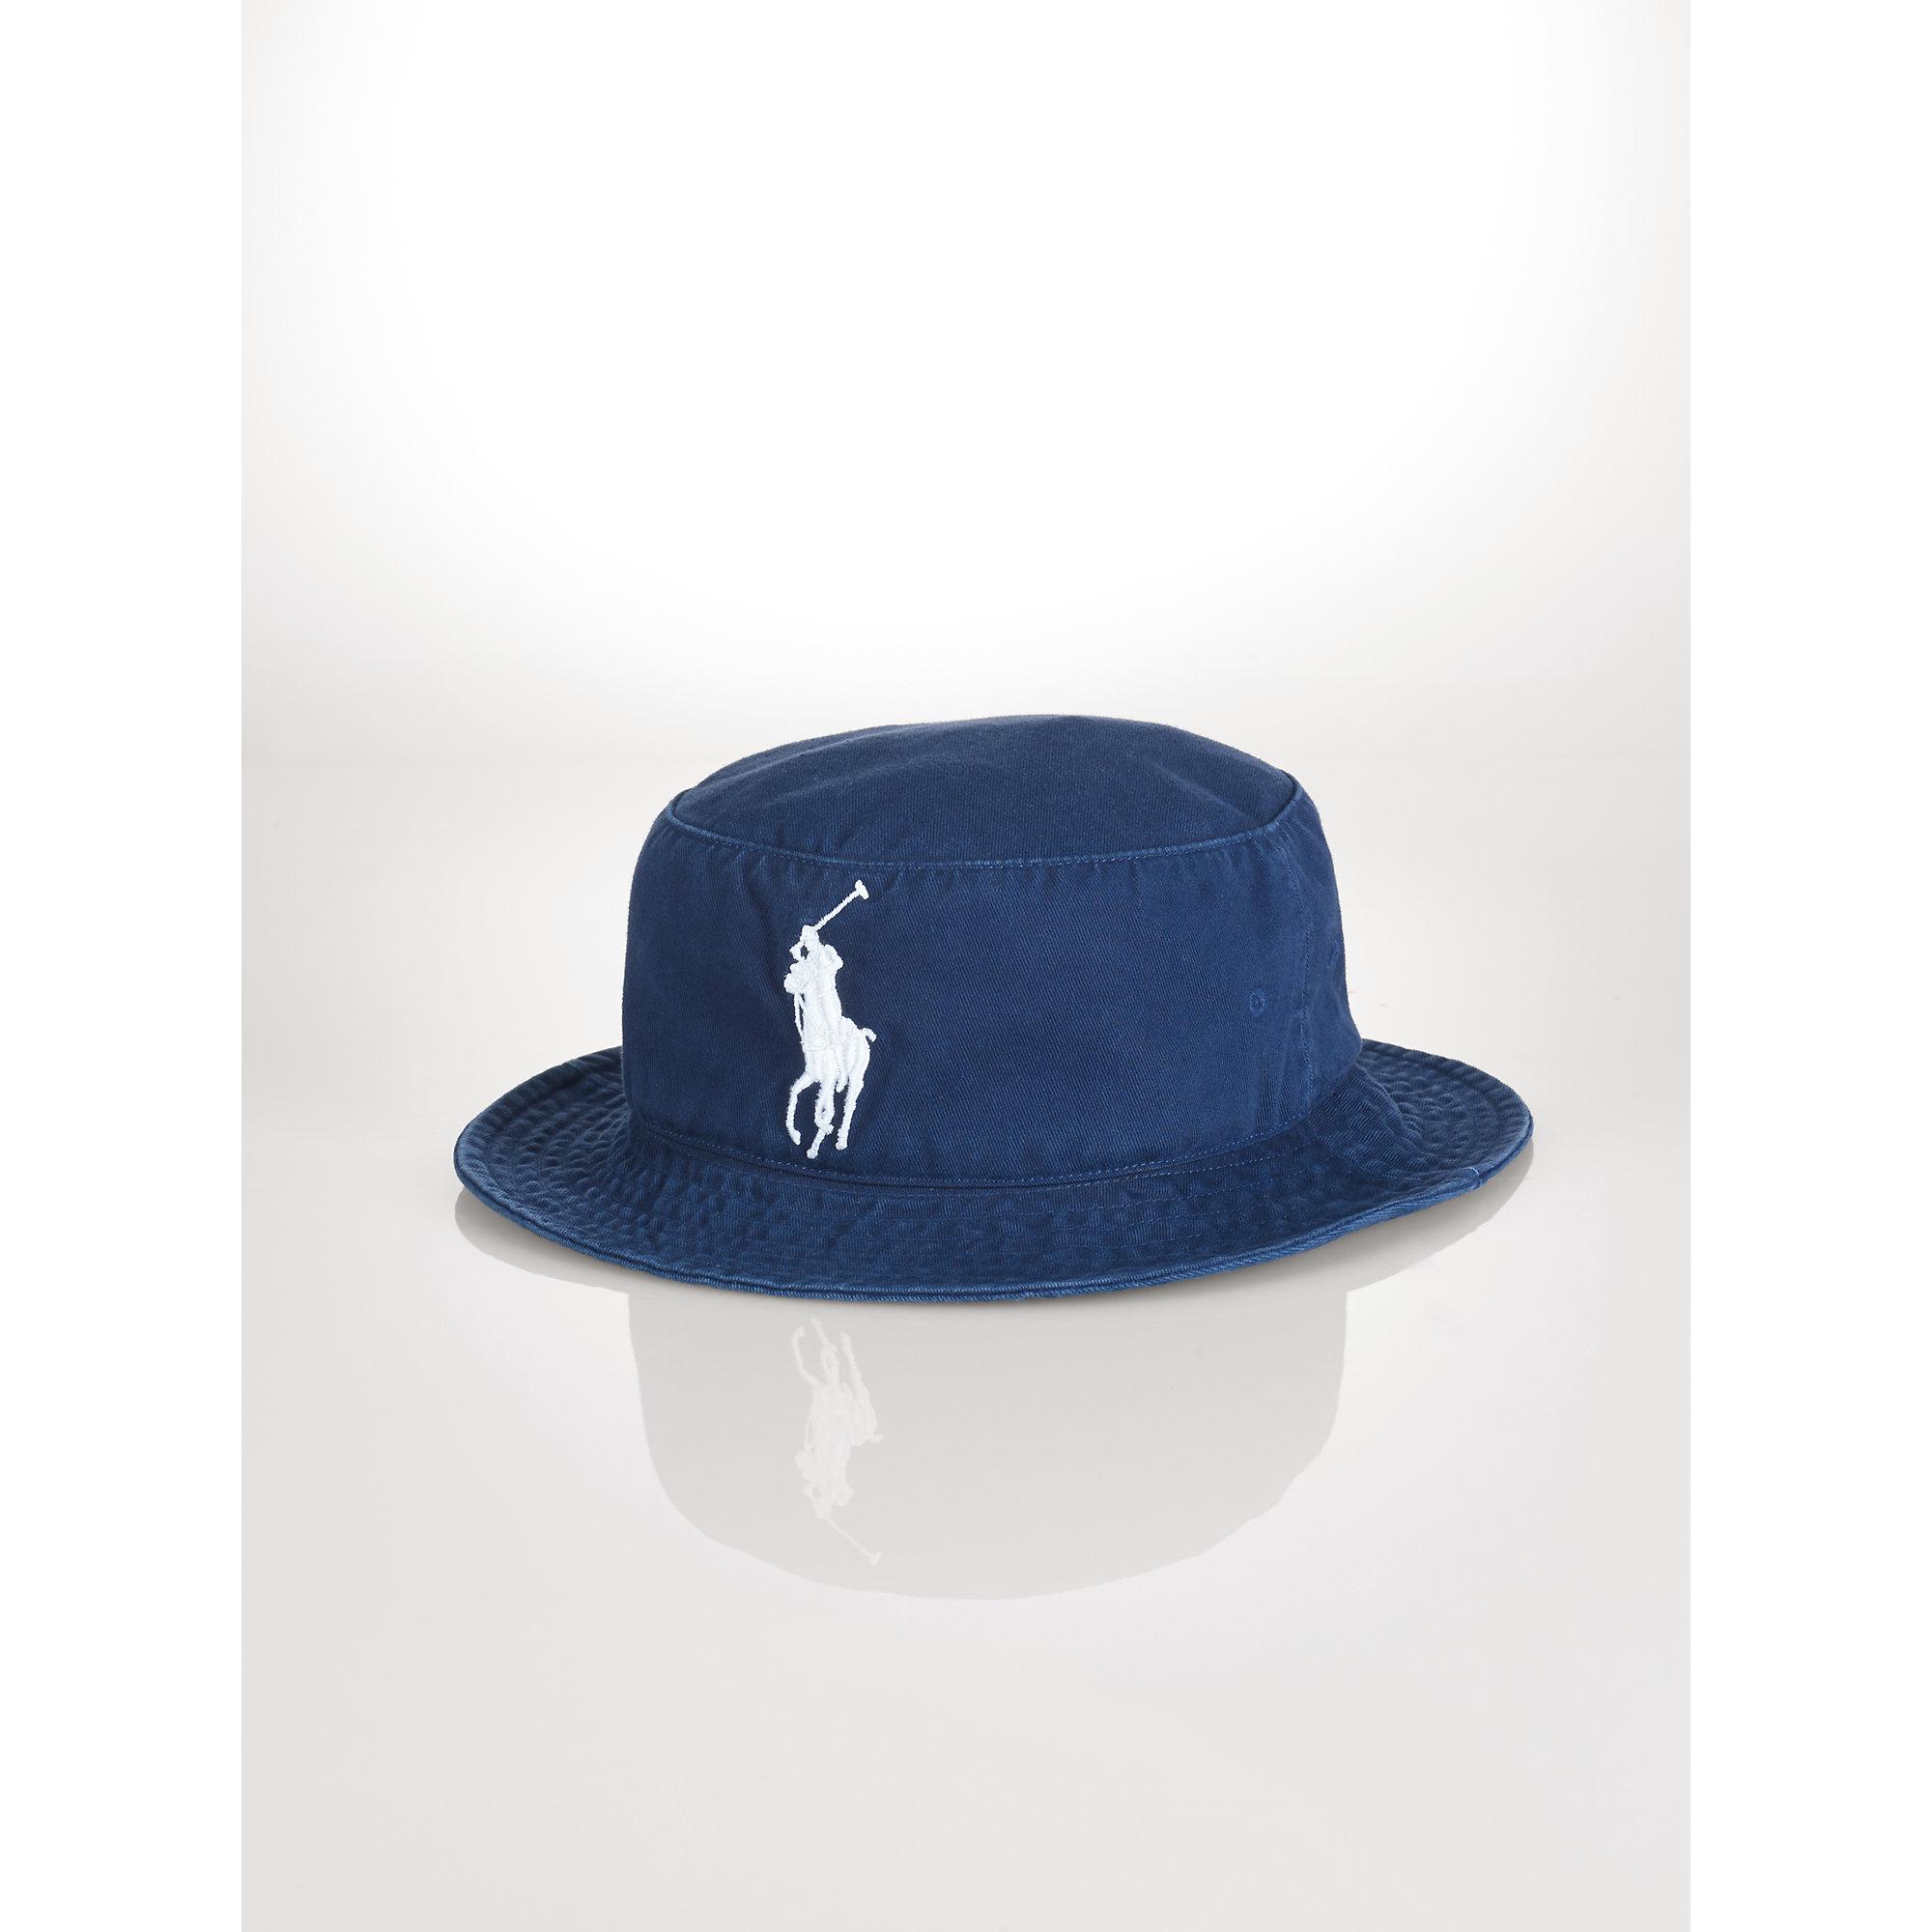 fddb3174626 Lyst - Polo Ralph Lauren Us Open Bucket Hat in Blue for Men